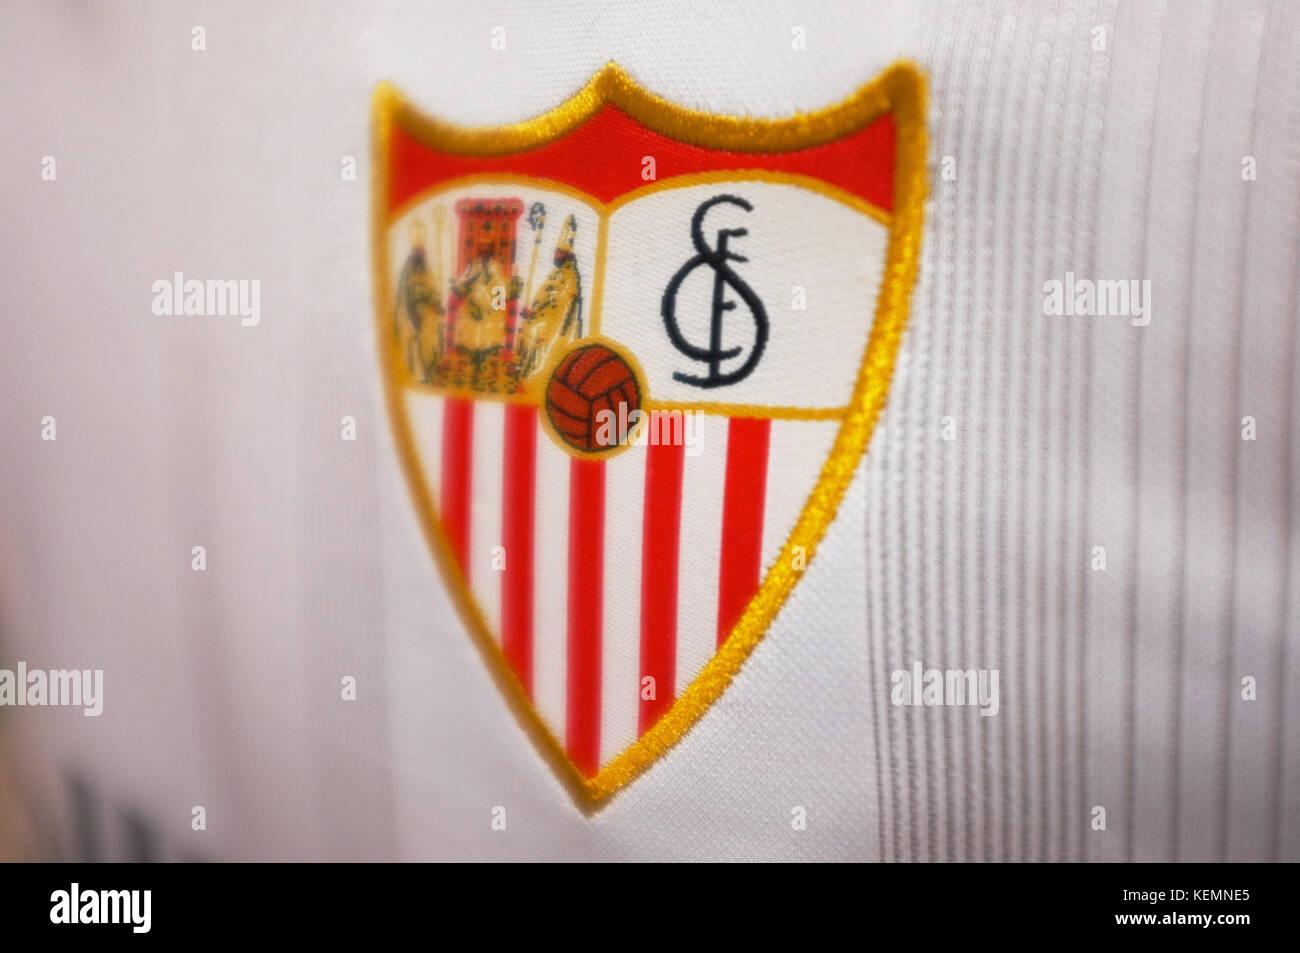 The crest of Sevilla FC on a shirt in the shop at Ramón Sánchez Pizjuán Stadium, Sevilla FC vs Las - Stock Image